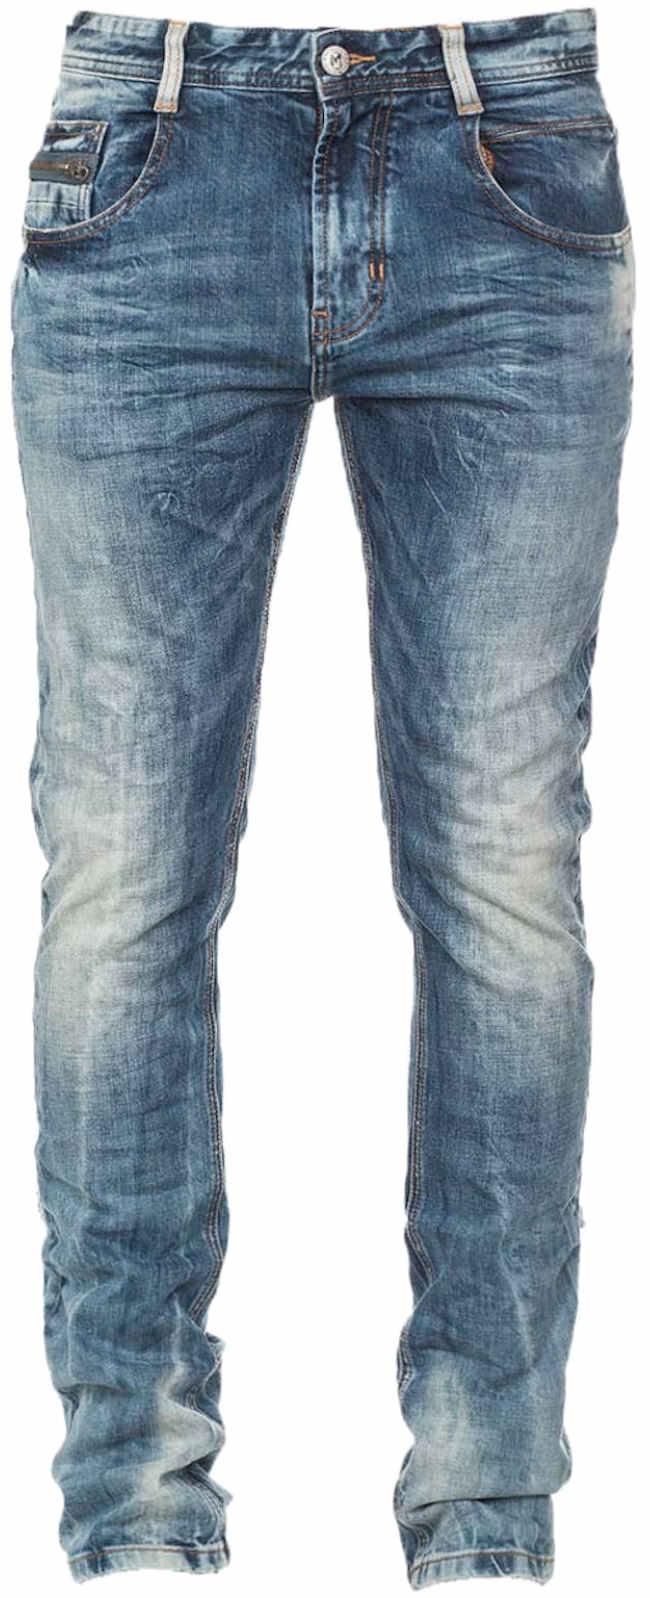 Slim Fit Mod Herren Medium Regular Denim o M Neu Carl Waist 1007 Jeans Nos d Leg 7qZwPB